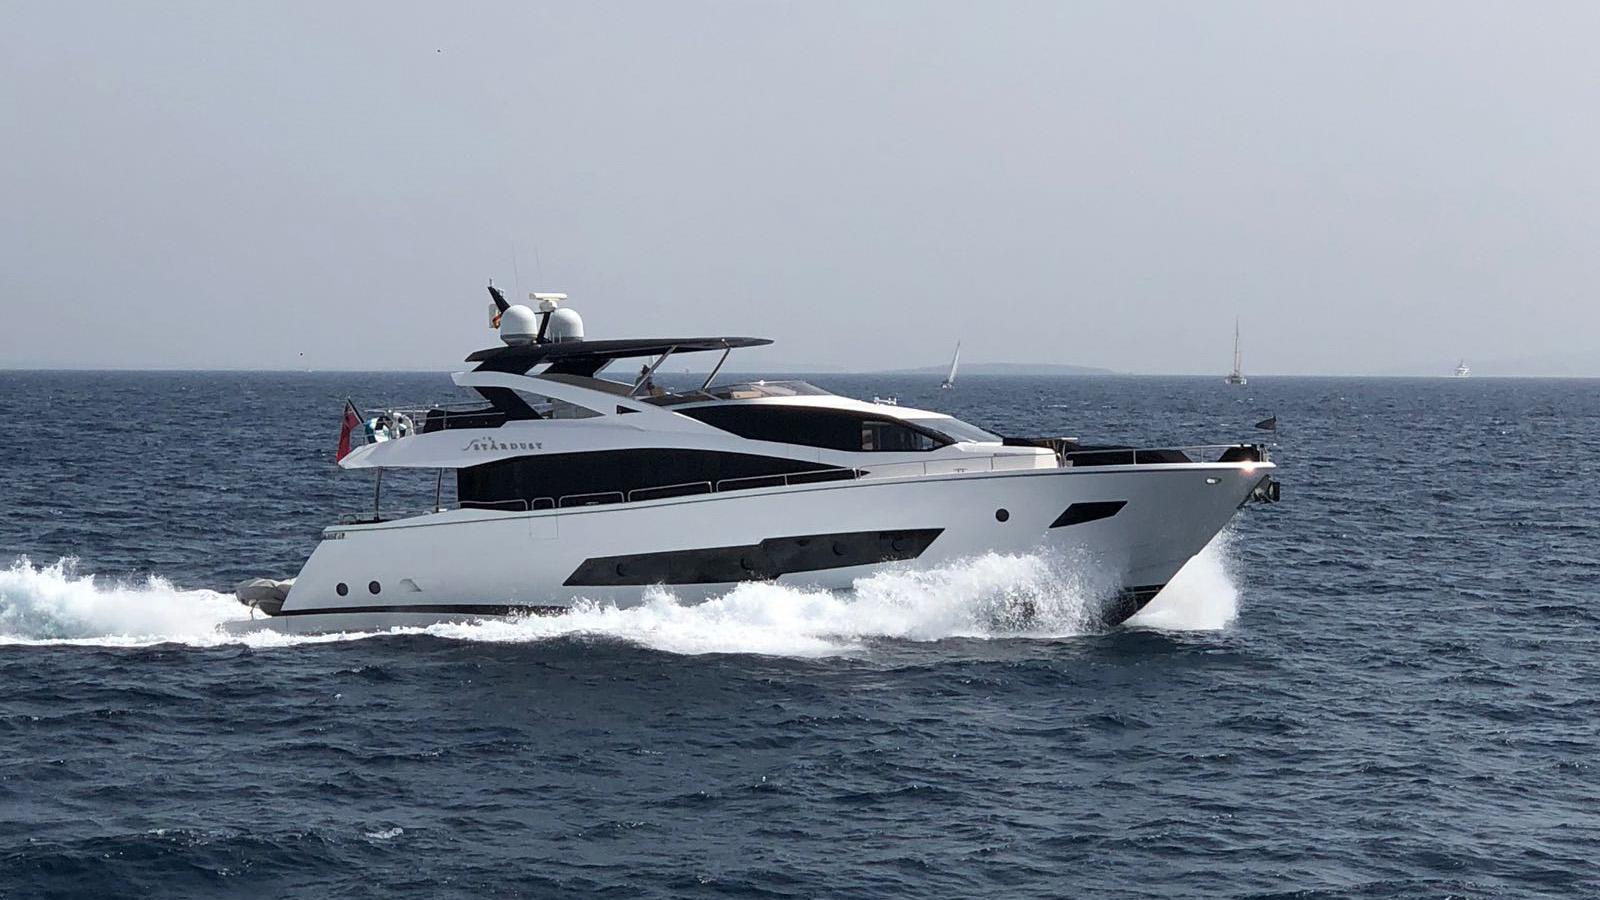 Sunseeker 86 Yacht - Stardust of Poole - Running